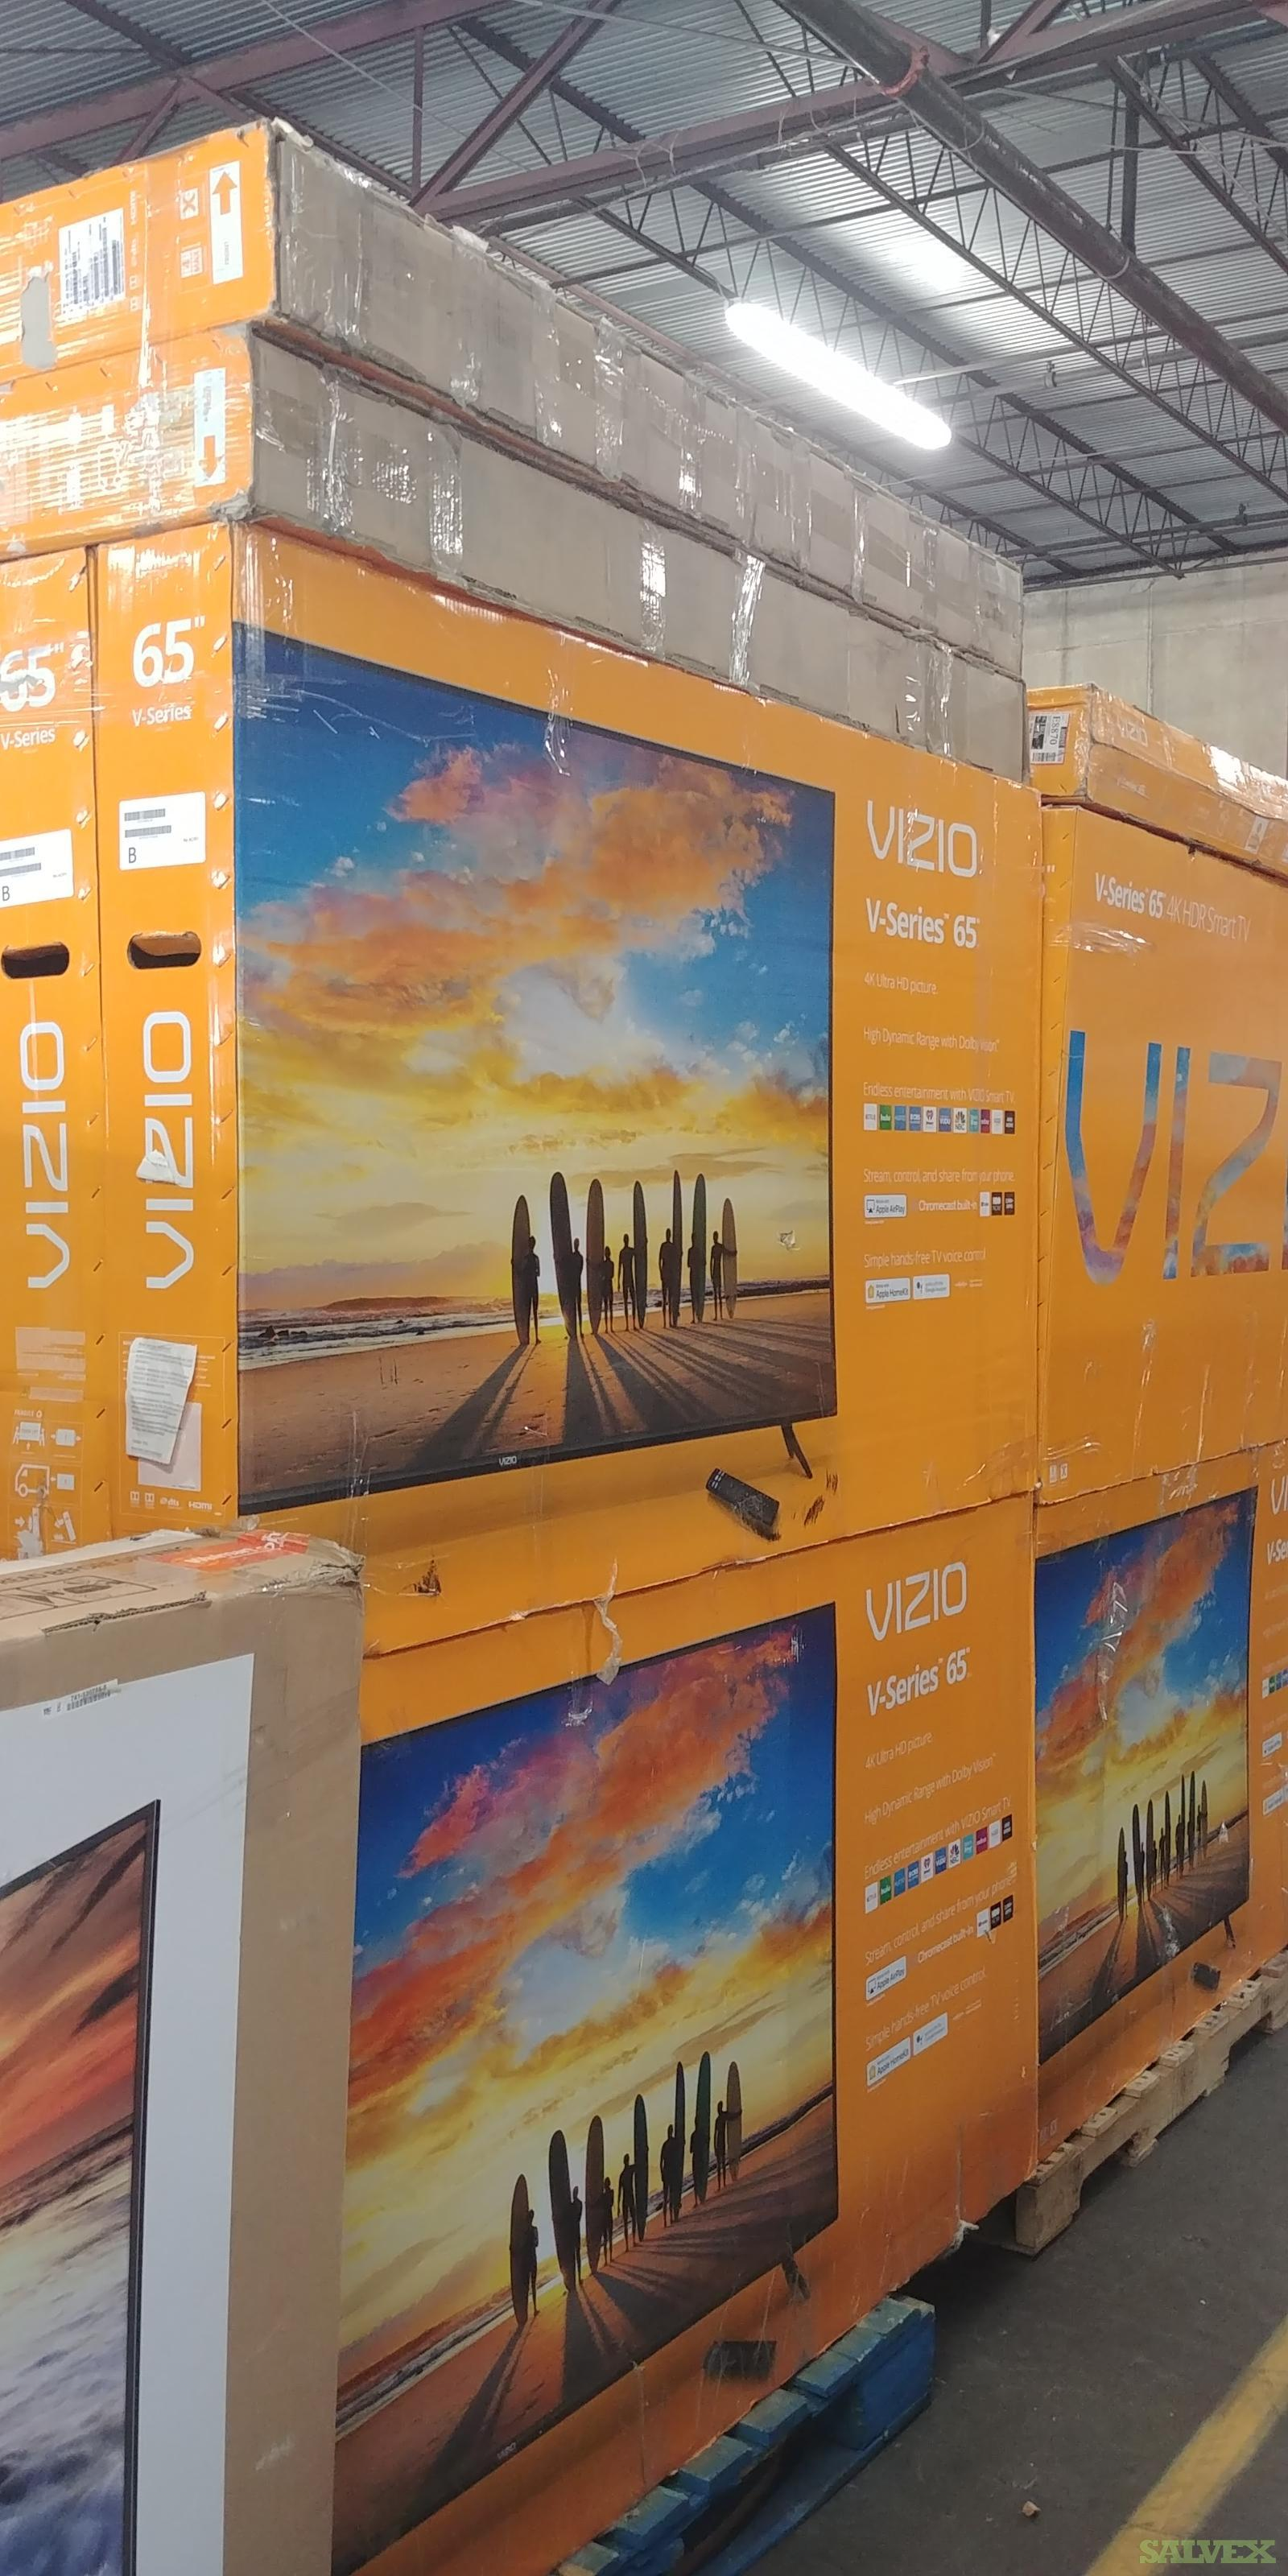 Vizio Televisions - Salvage (350 Units)